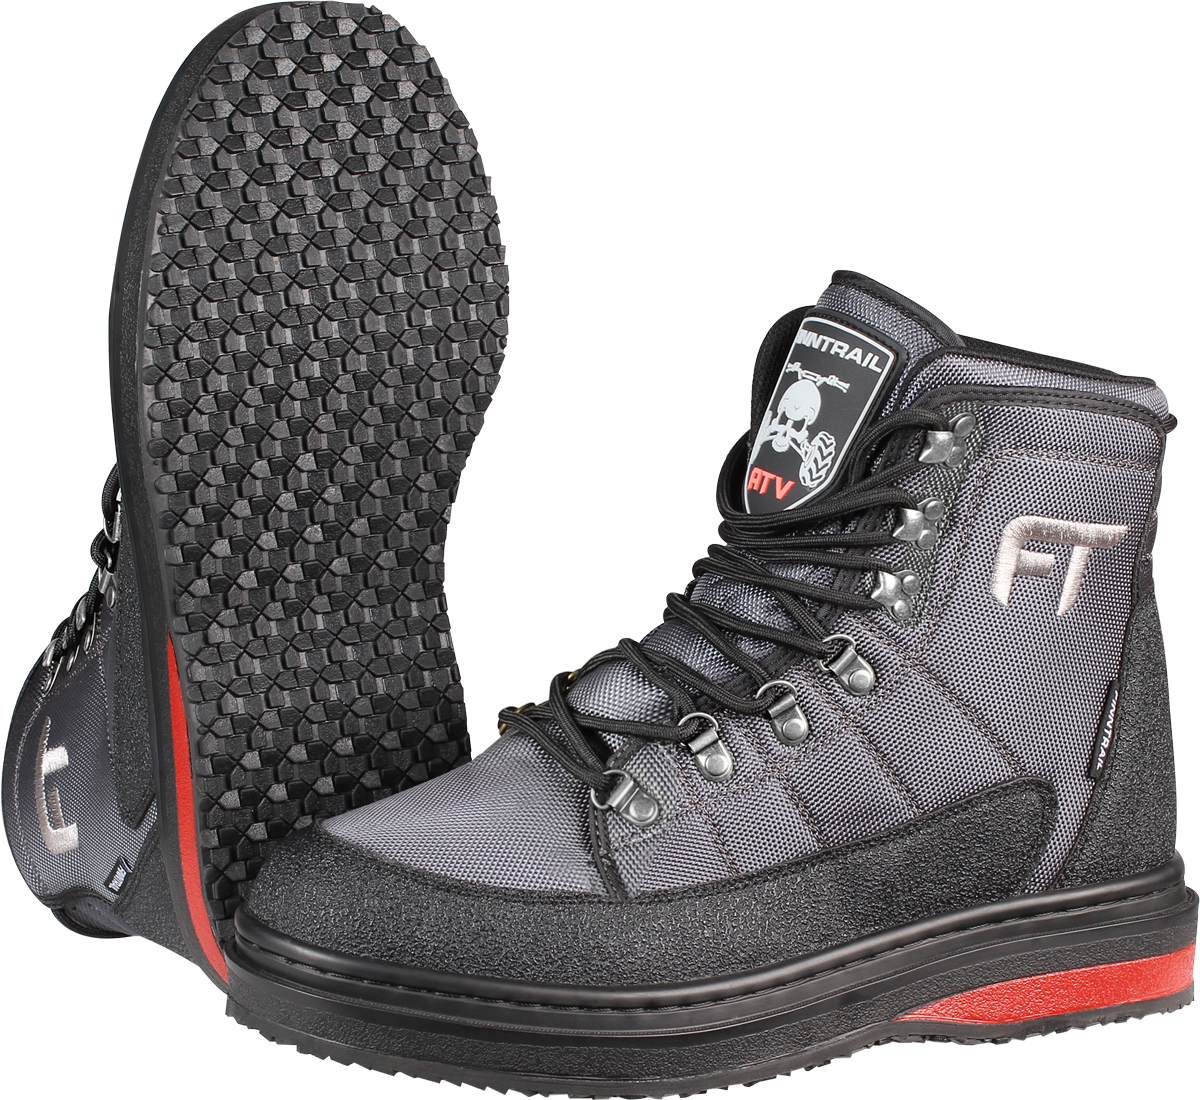 Ботинки для рыбалки Finntrail Runner, цвет: серый, черный, красный. 5221. Размер 44